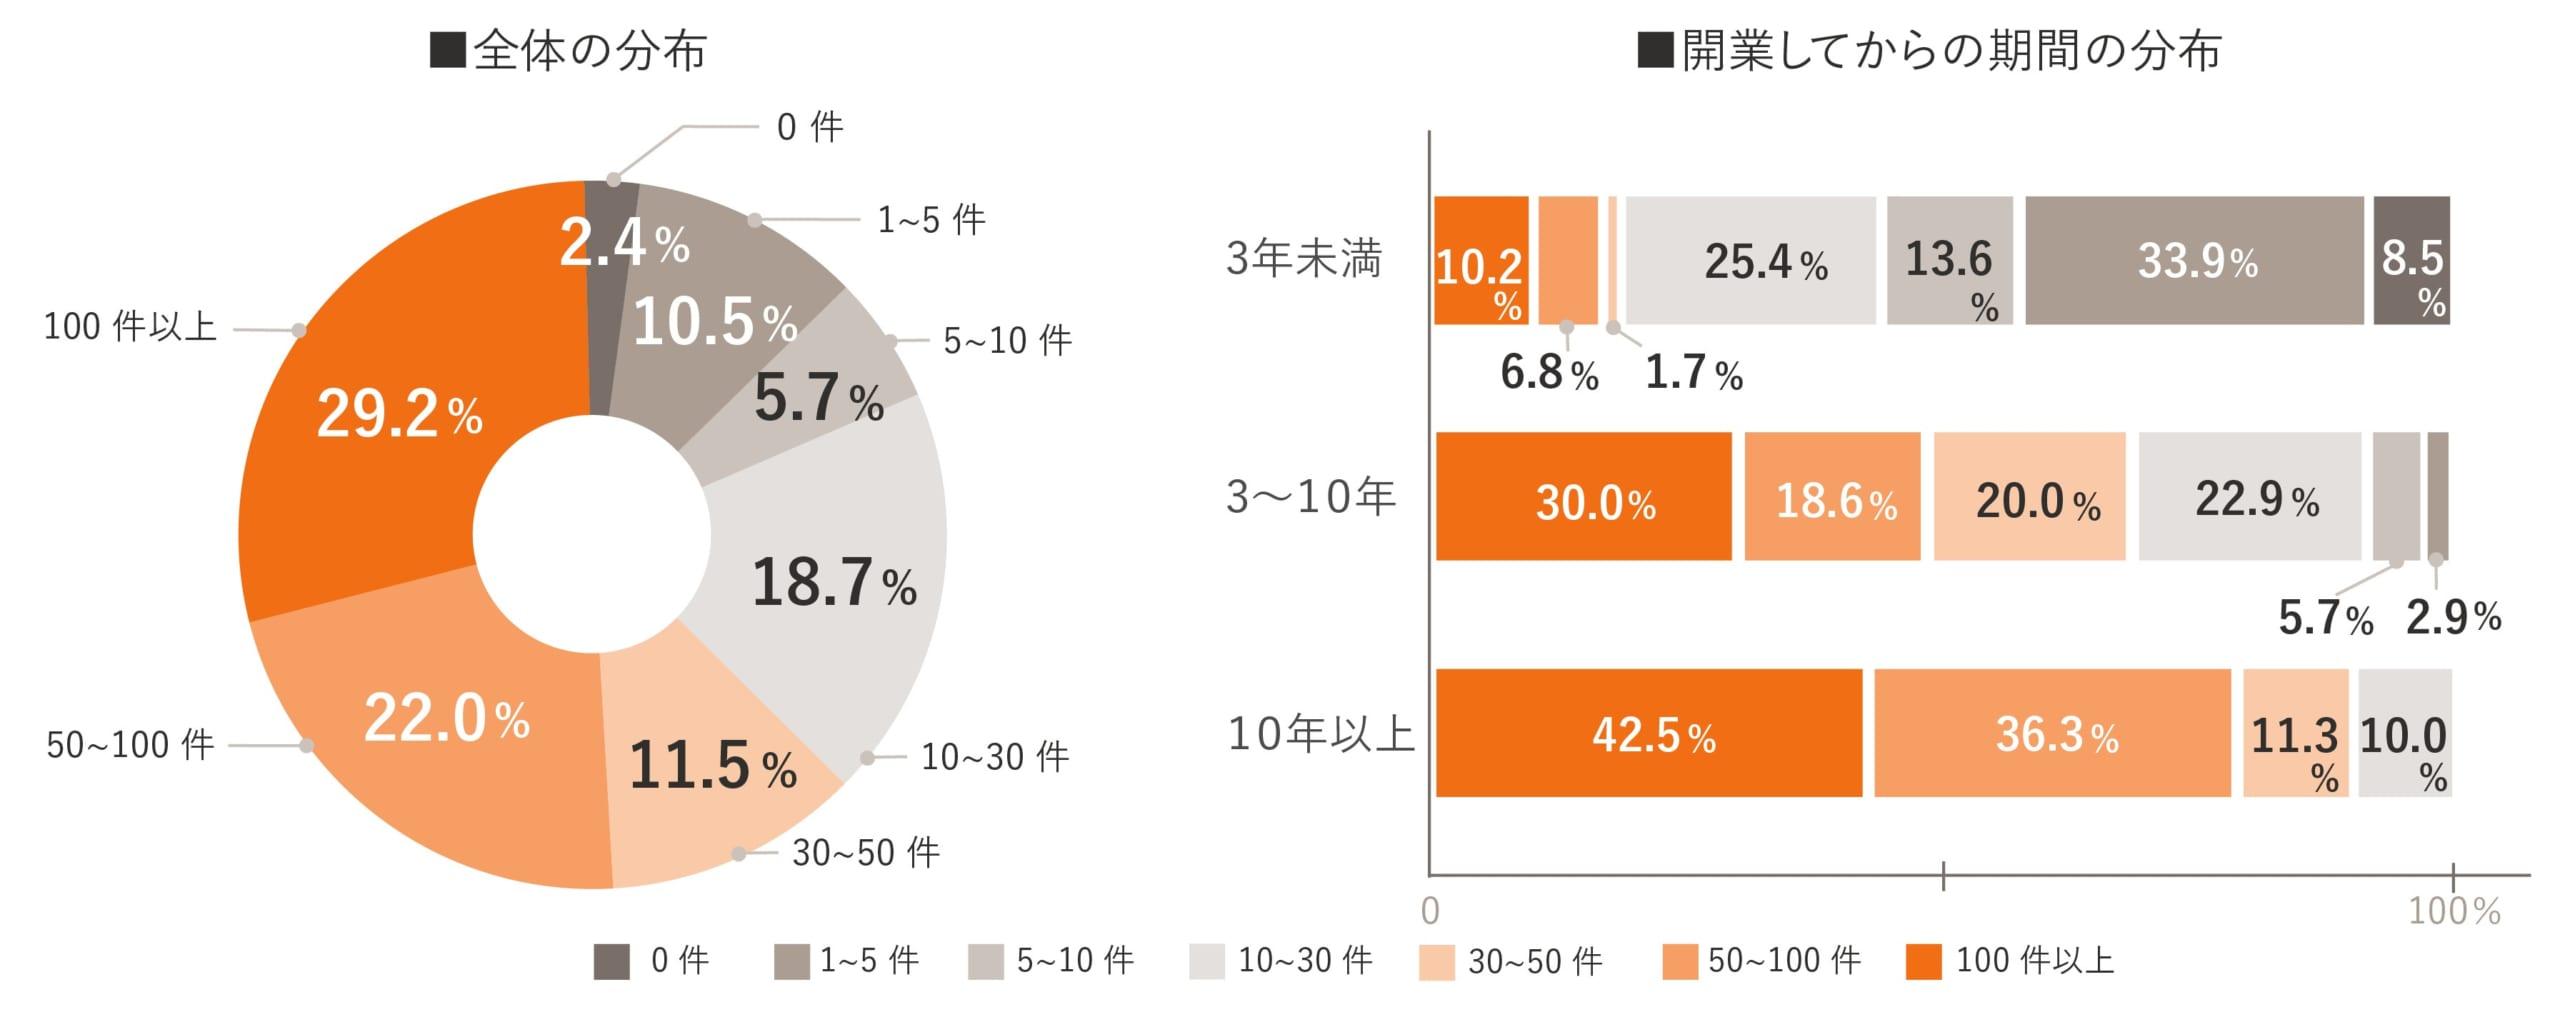 独立開業実態調査グラフ10